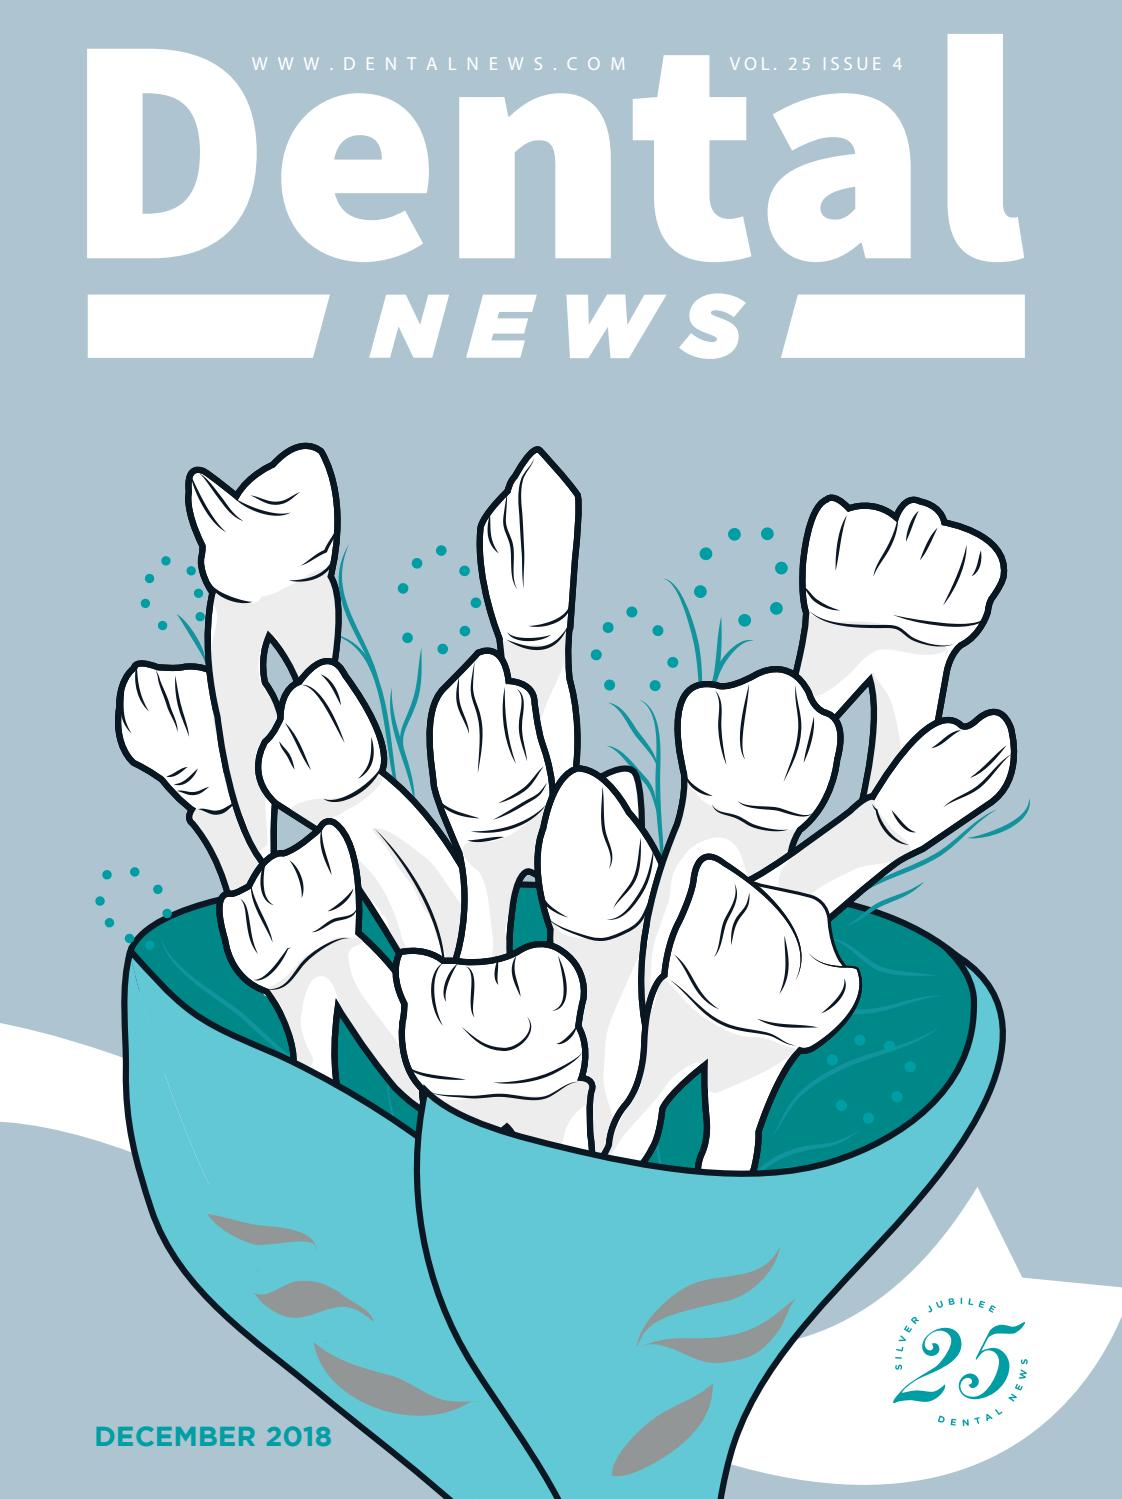 Dental News December 2018 + Yearbook 2019 by Dental News - issuu